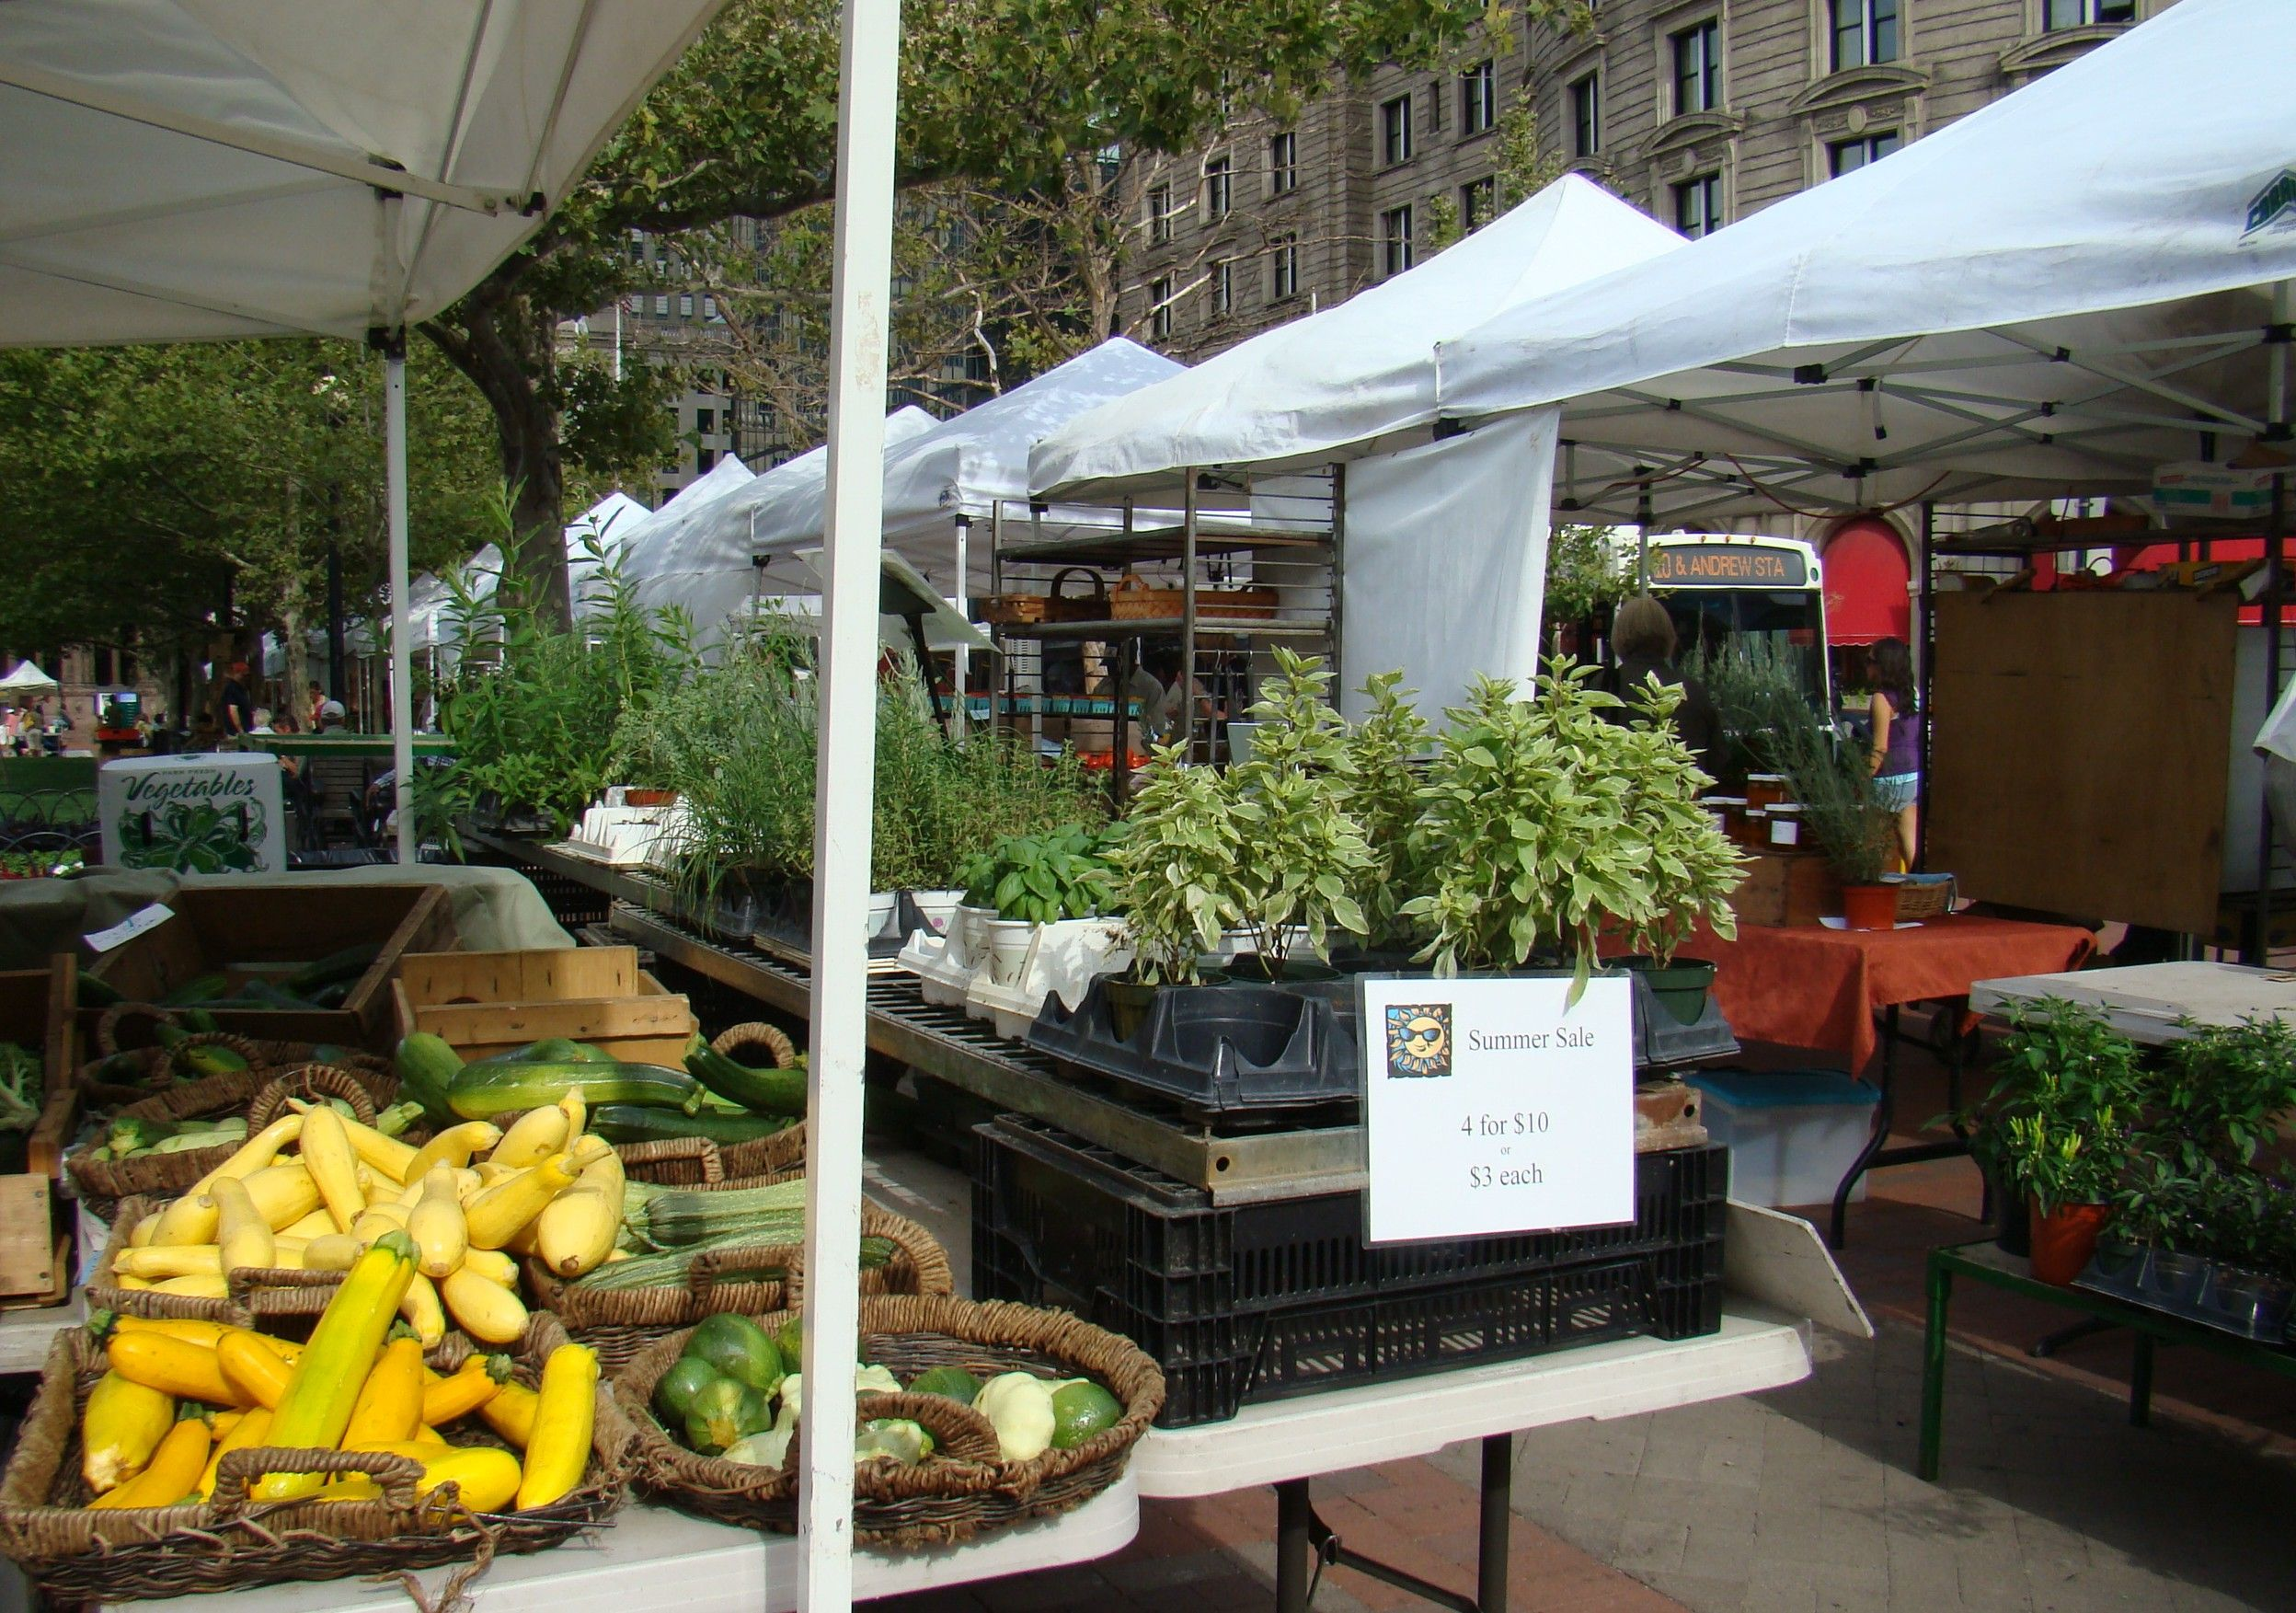 Boston farmers market local food farmers market farmer